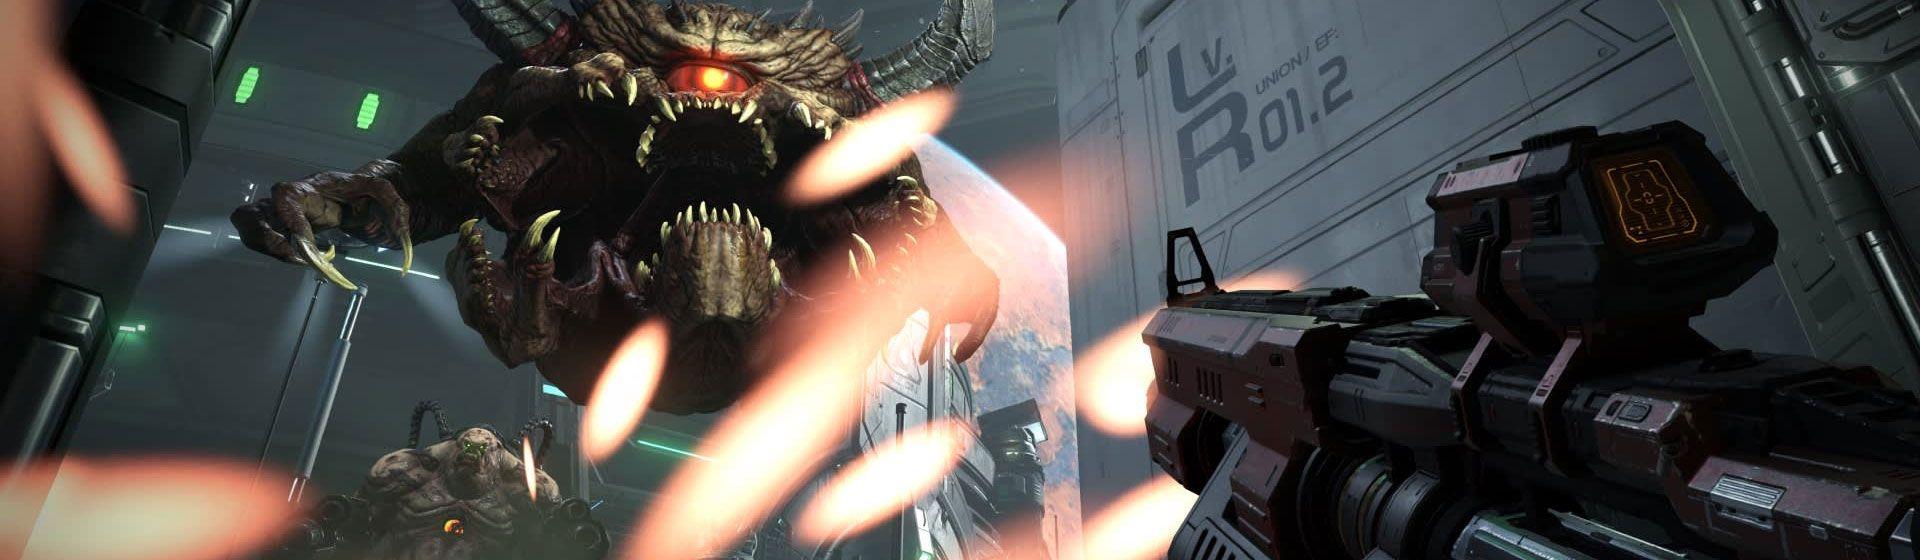 Xbox Game Pass recebe 20 games da Bethesda no catálogo